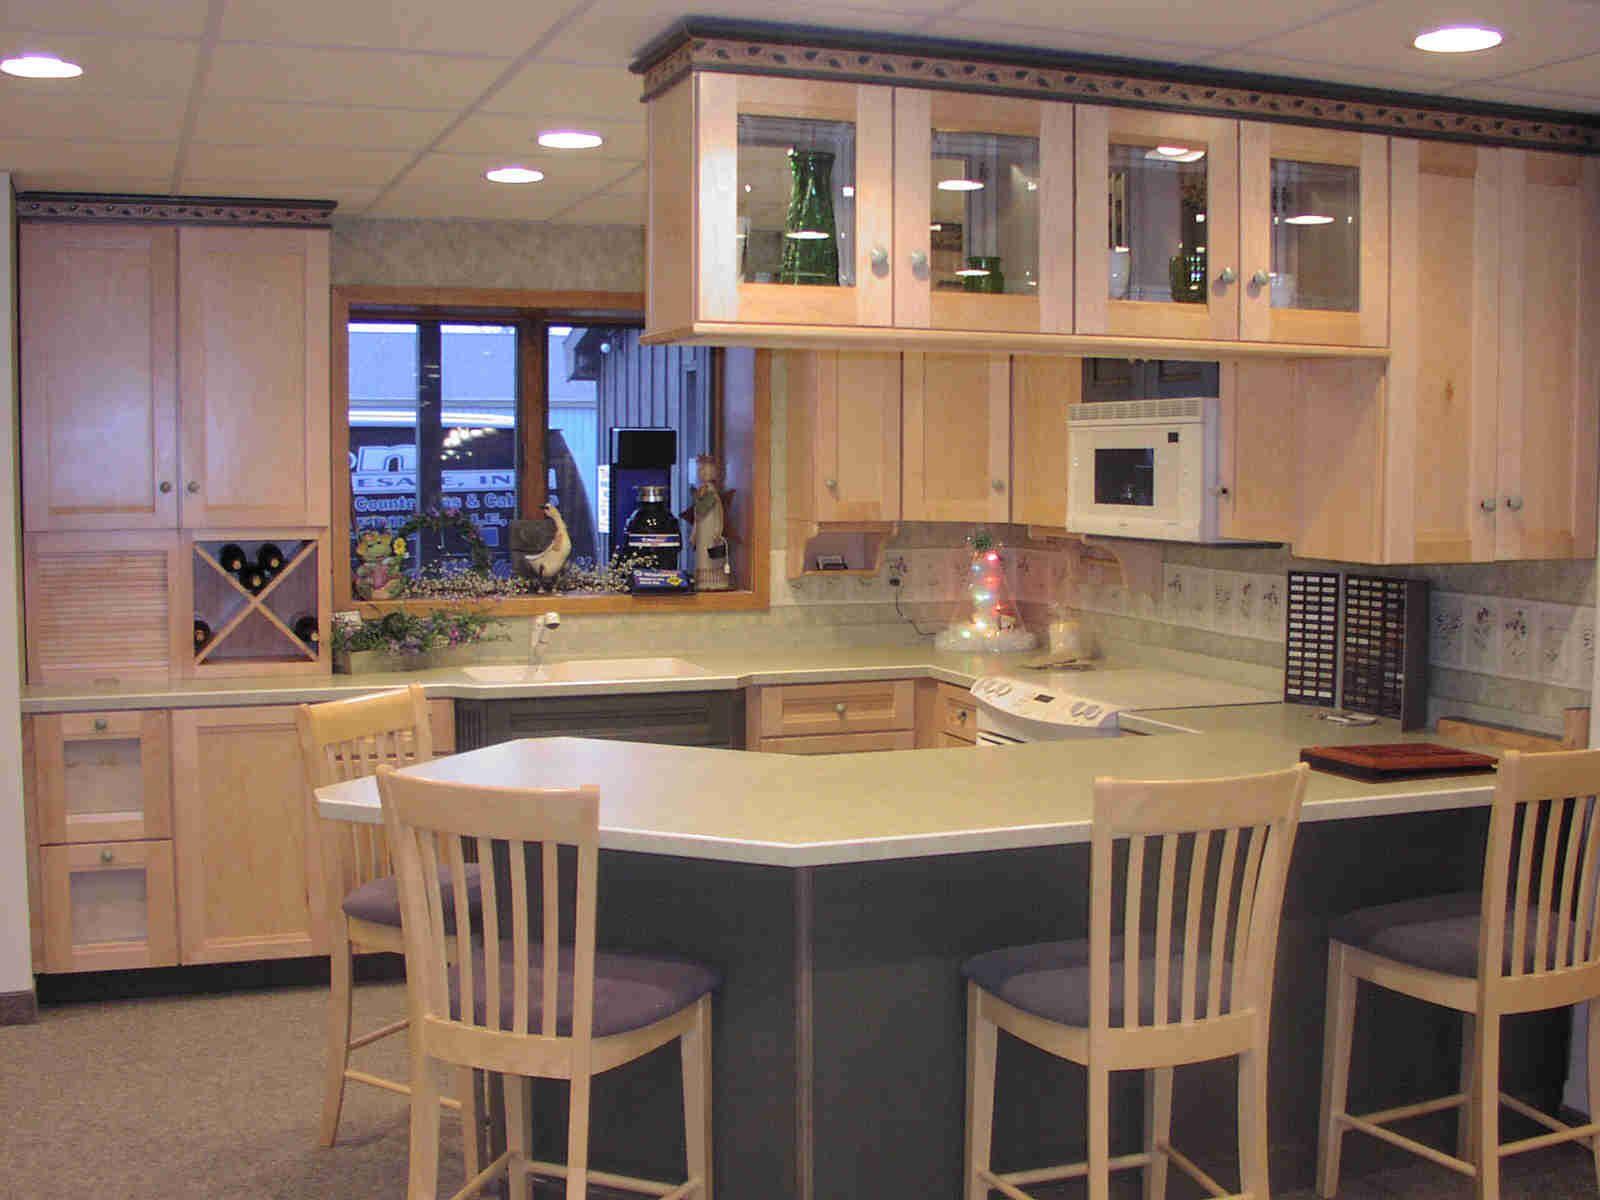 Kitchen-cabinet-kitchen-maid-cabinets-ceiling-hanging-u